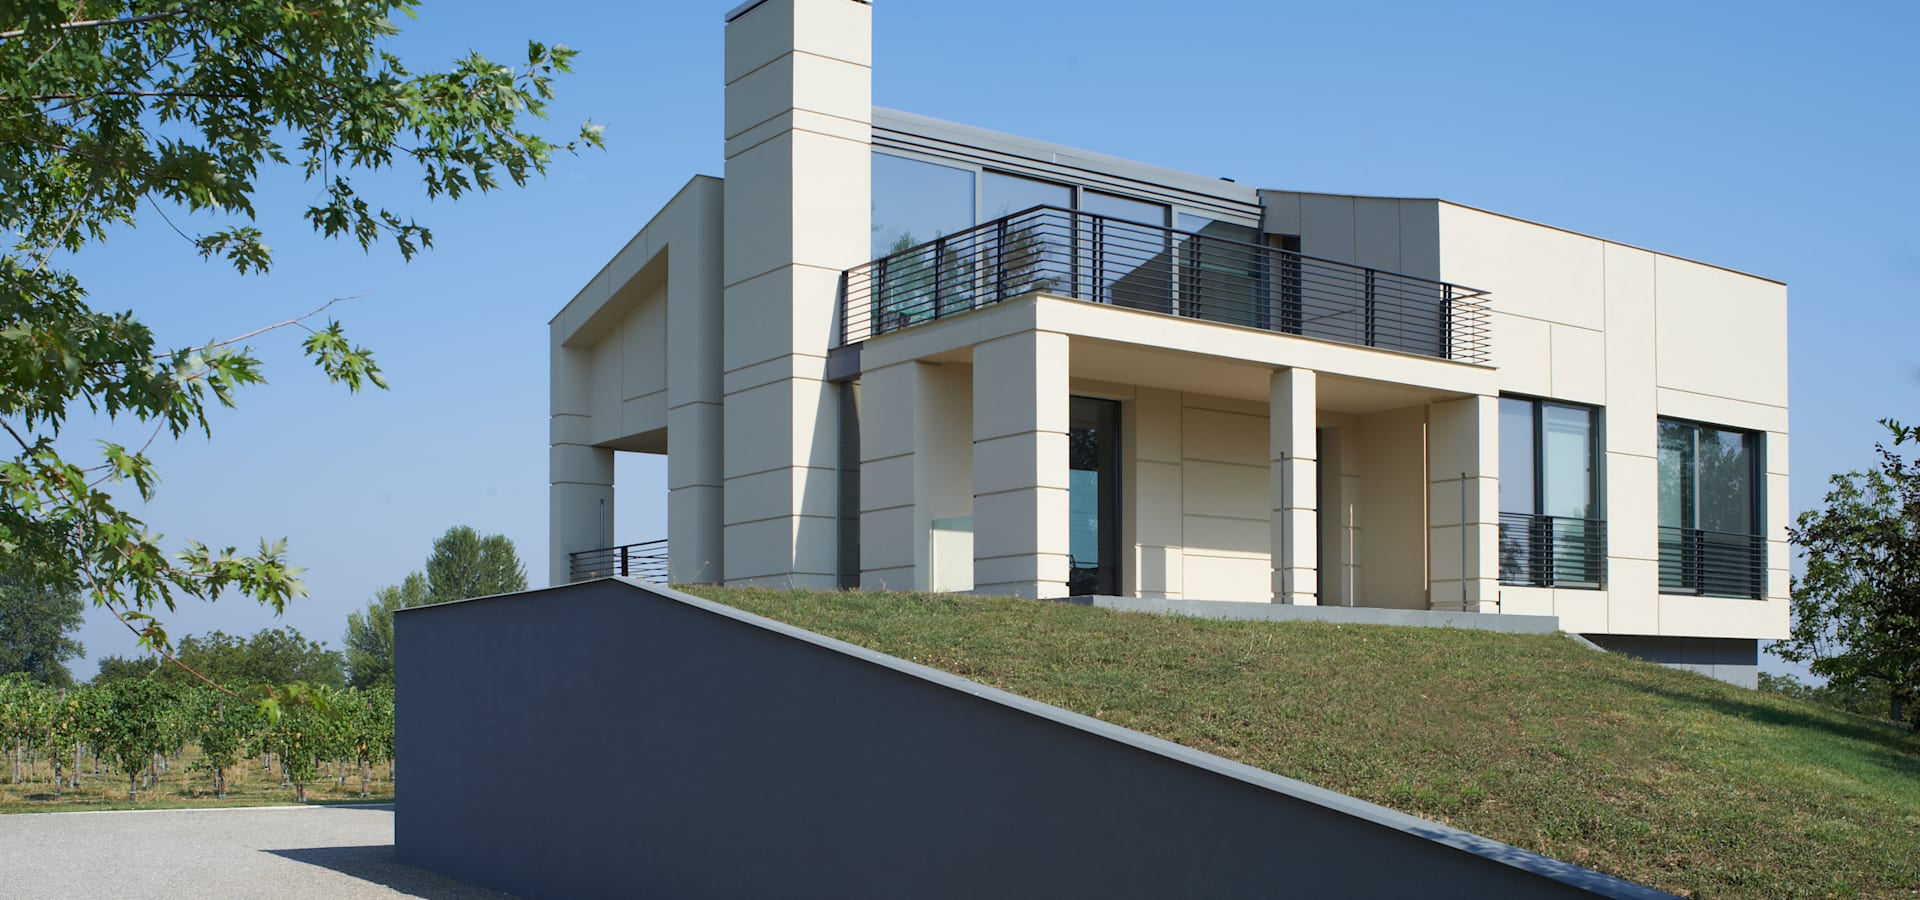 NAT OFFICE – christian gasparini architect